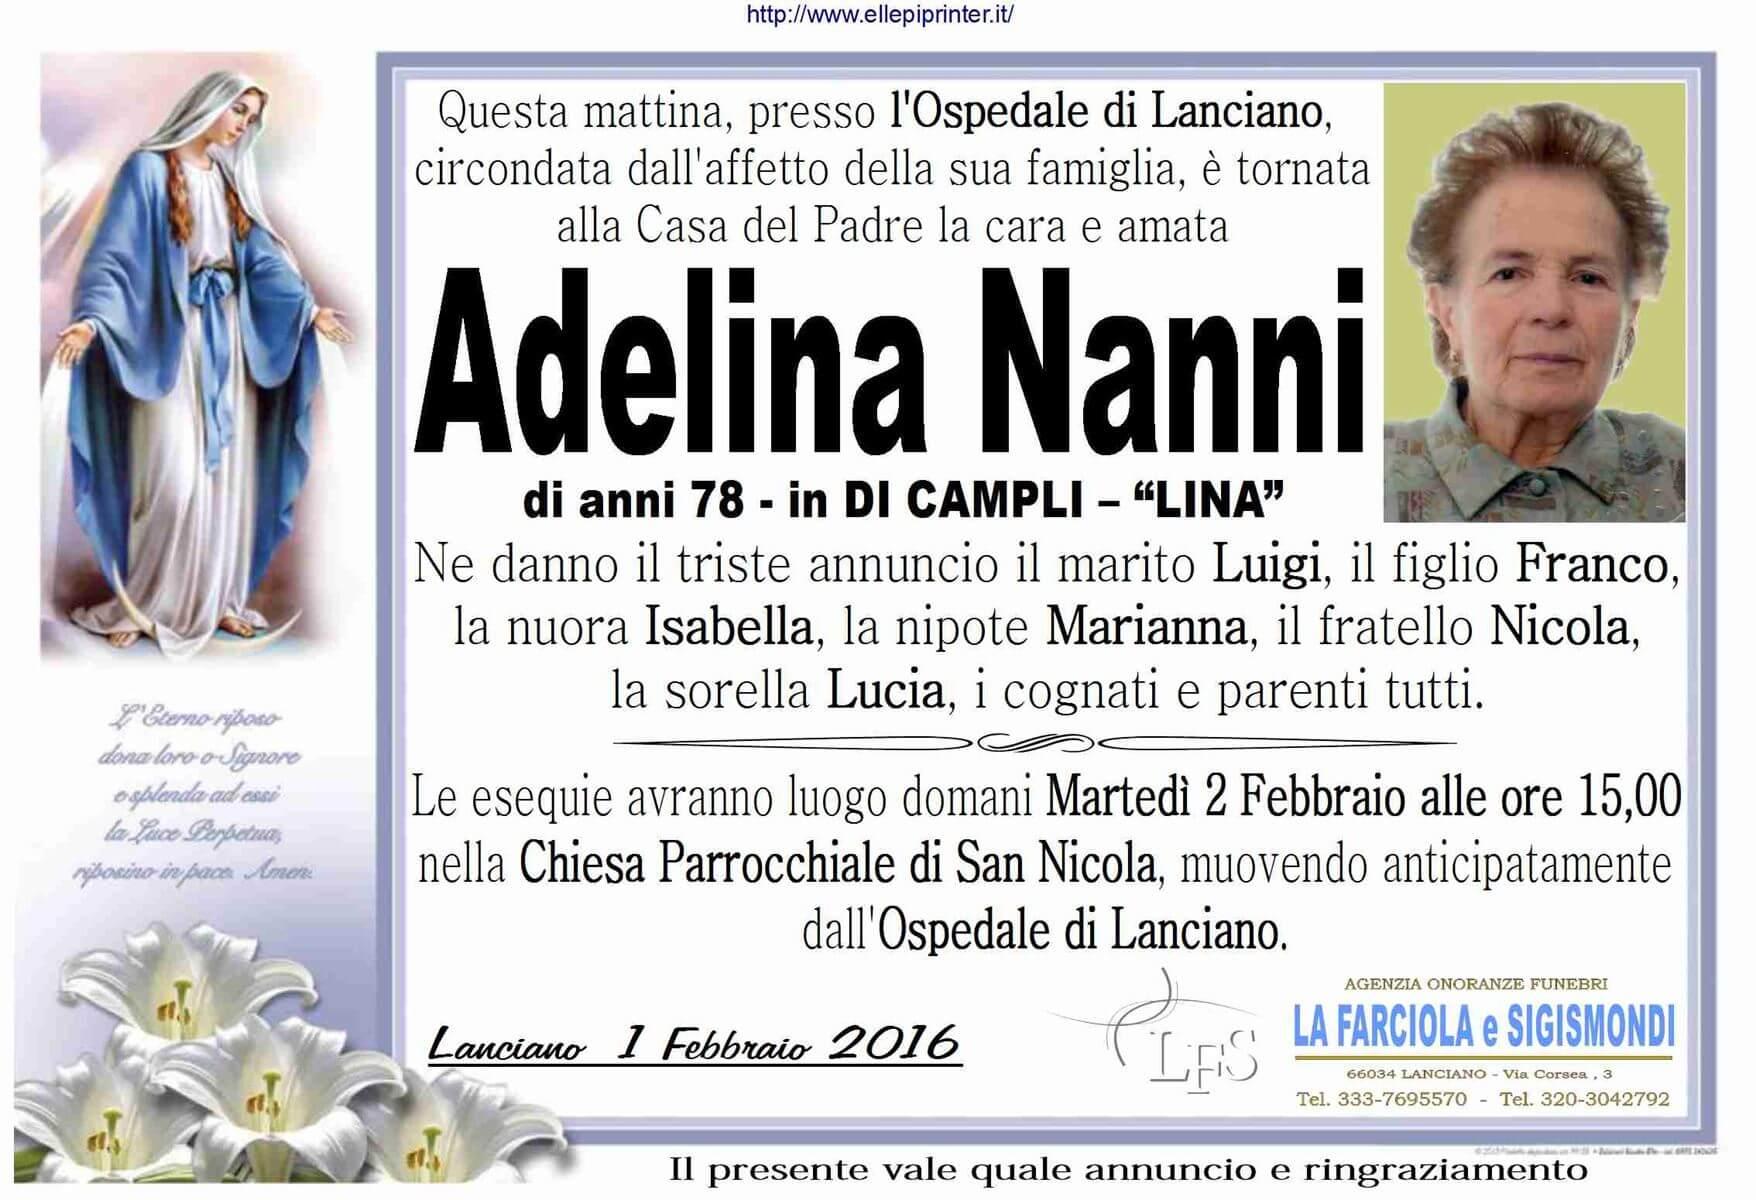 MANIFESTO NANNI ADELINA